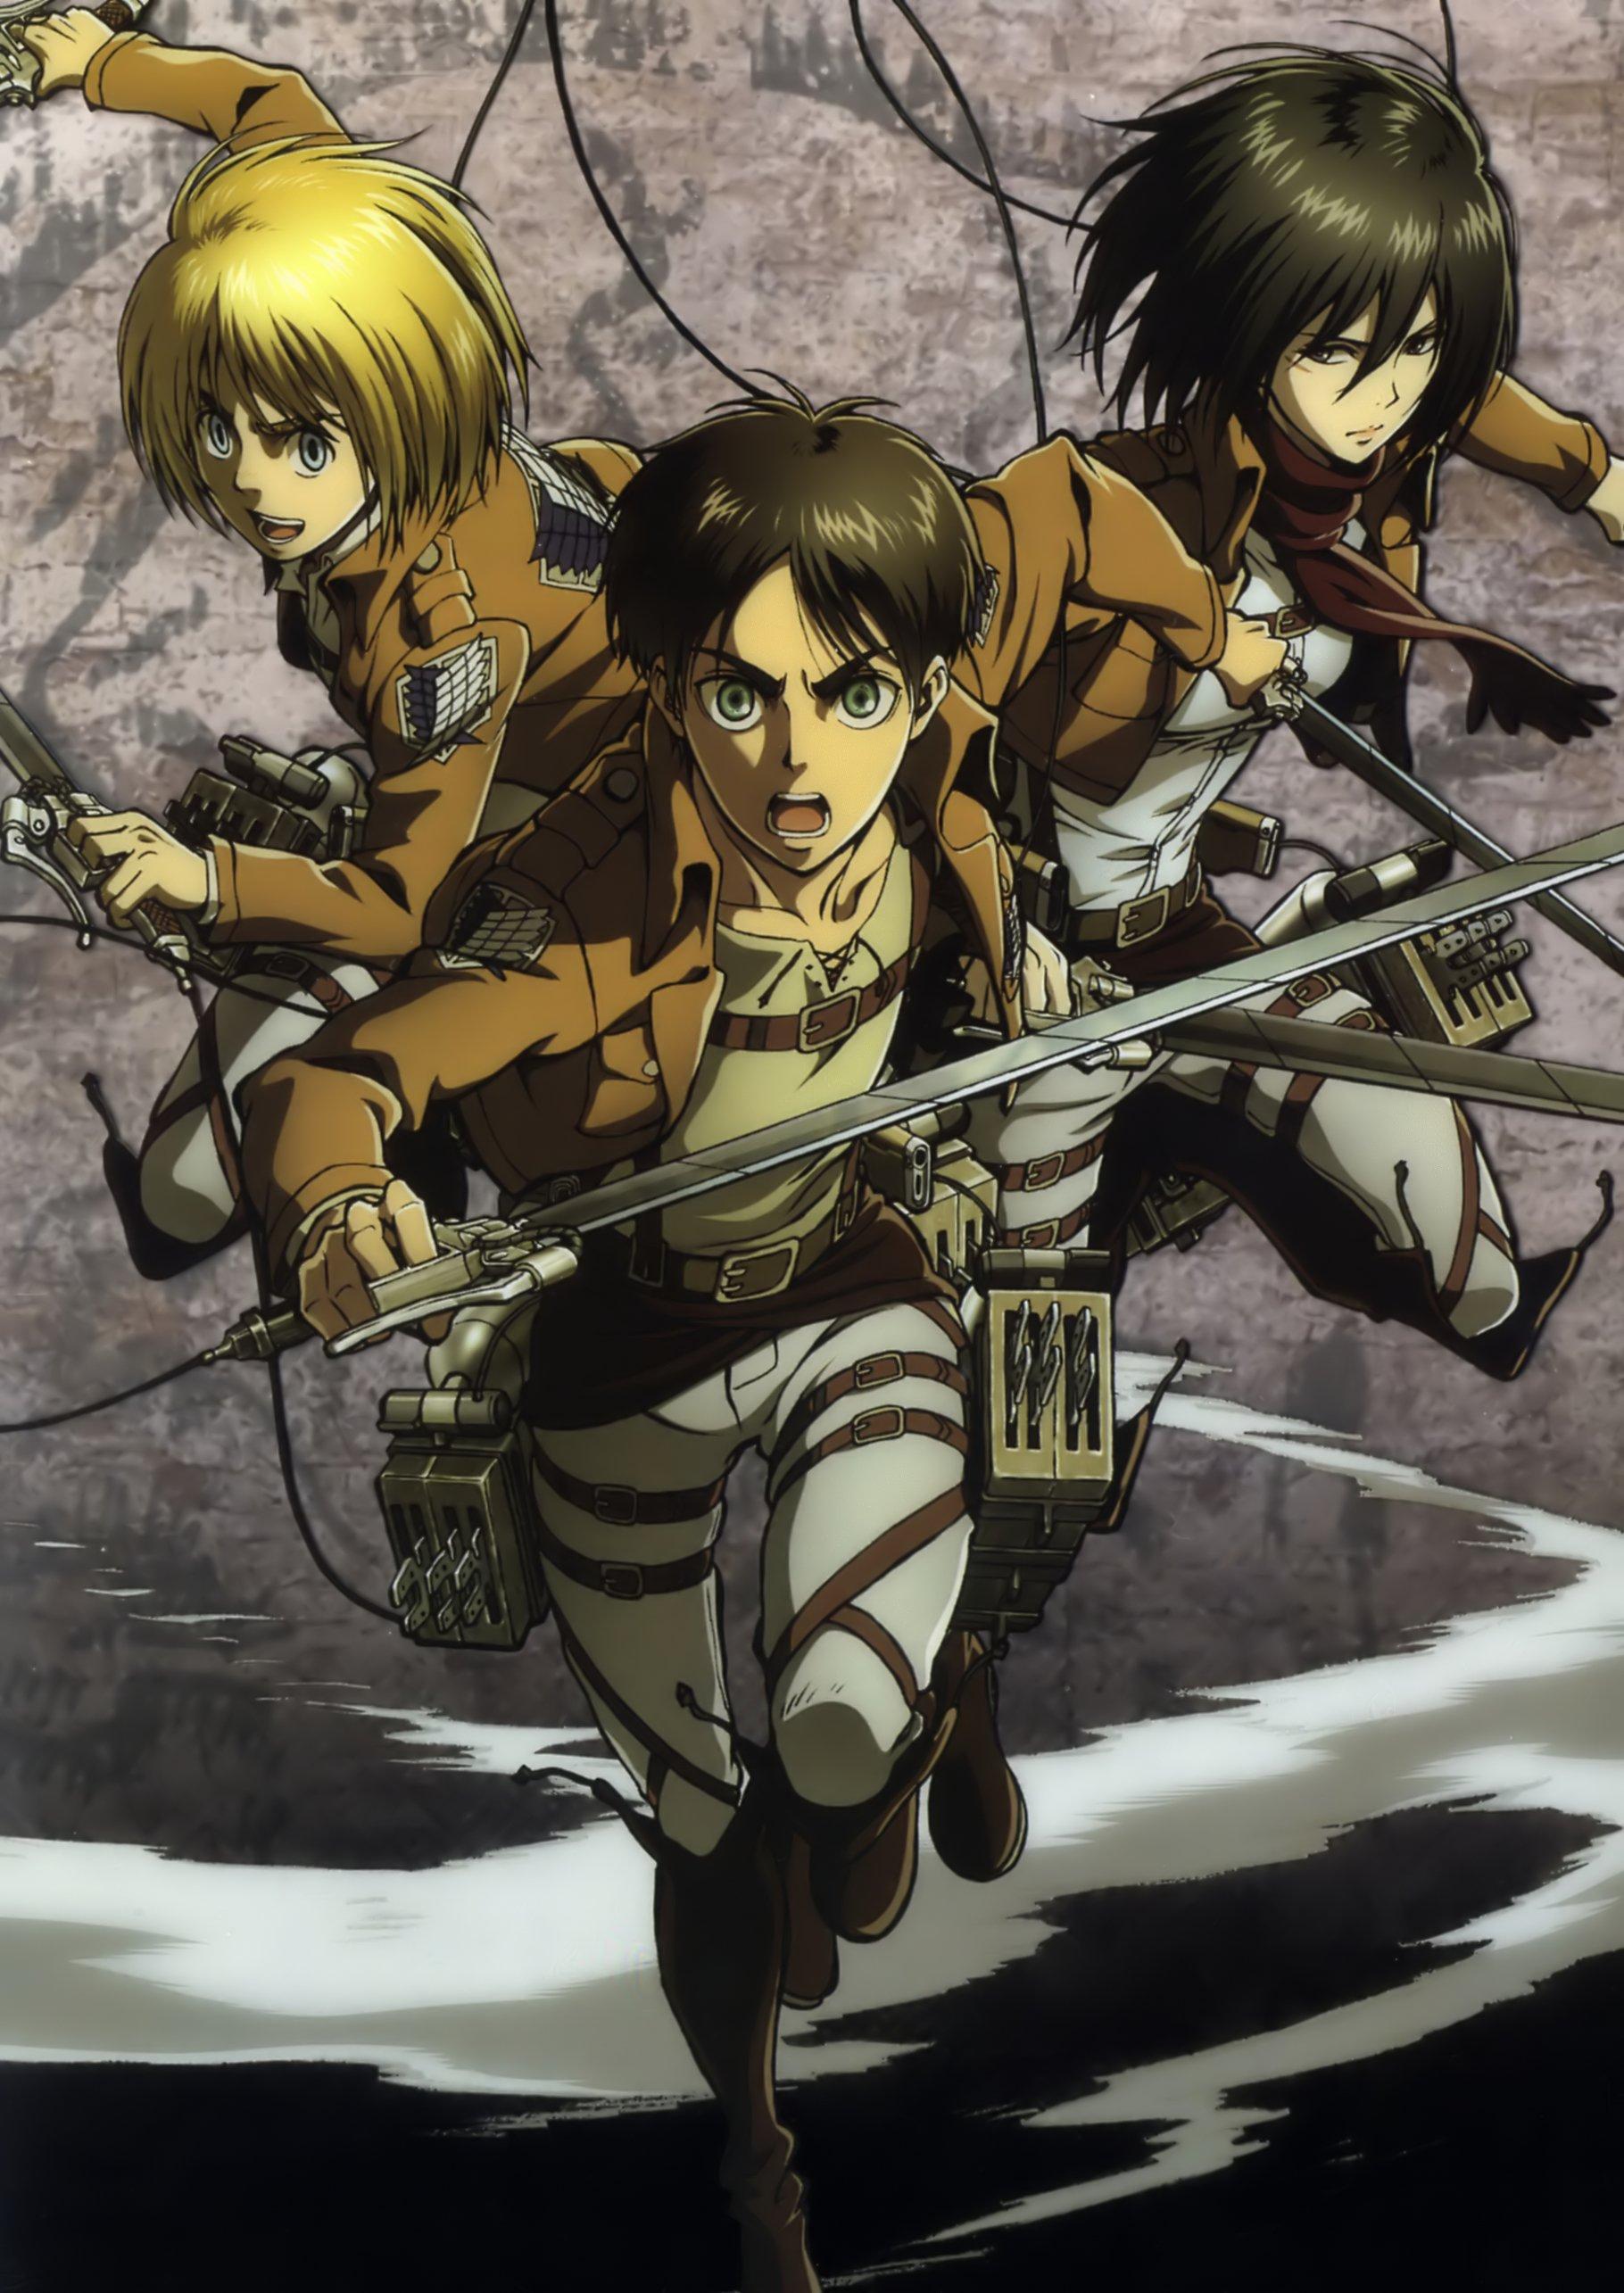 Anime Shingeki No Kyojin Series Armin Arlert Character Eren